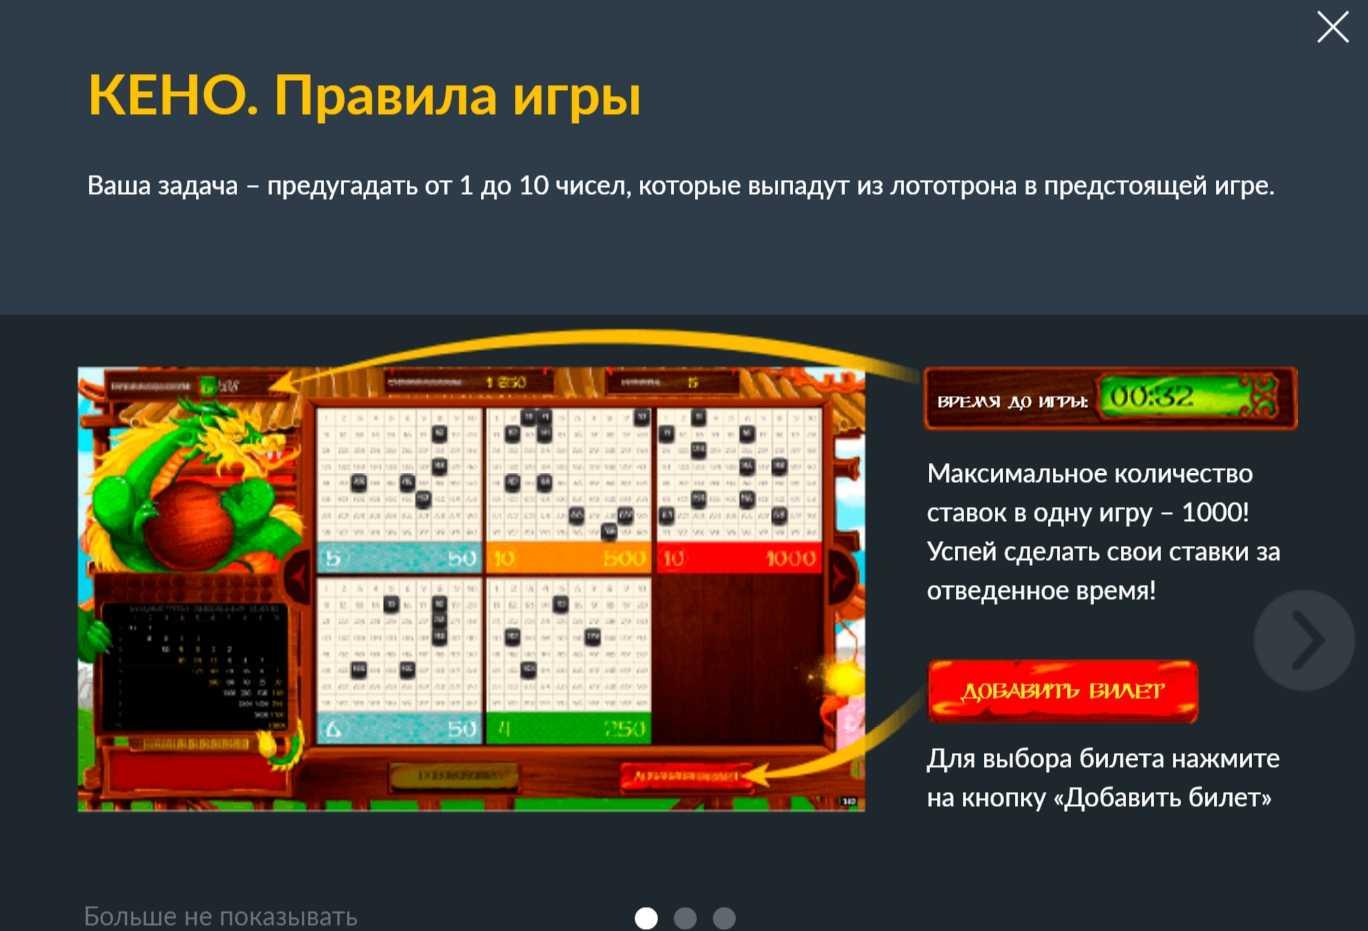 Lotto bingo 75 - undervands klipper + anmeldelser og anmeldelse 2020